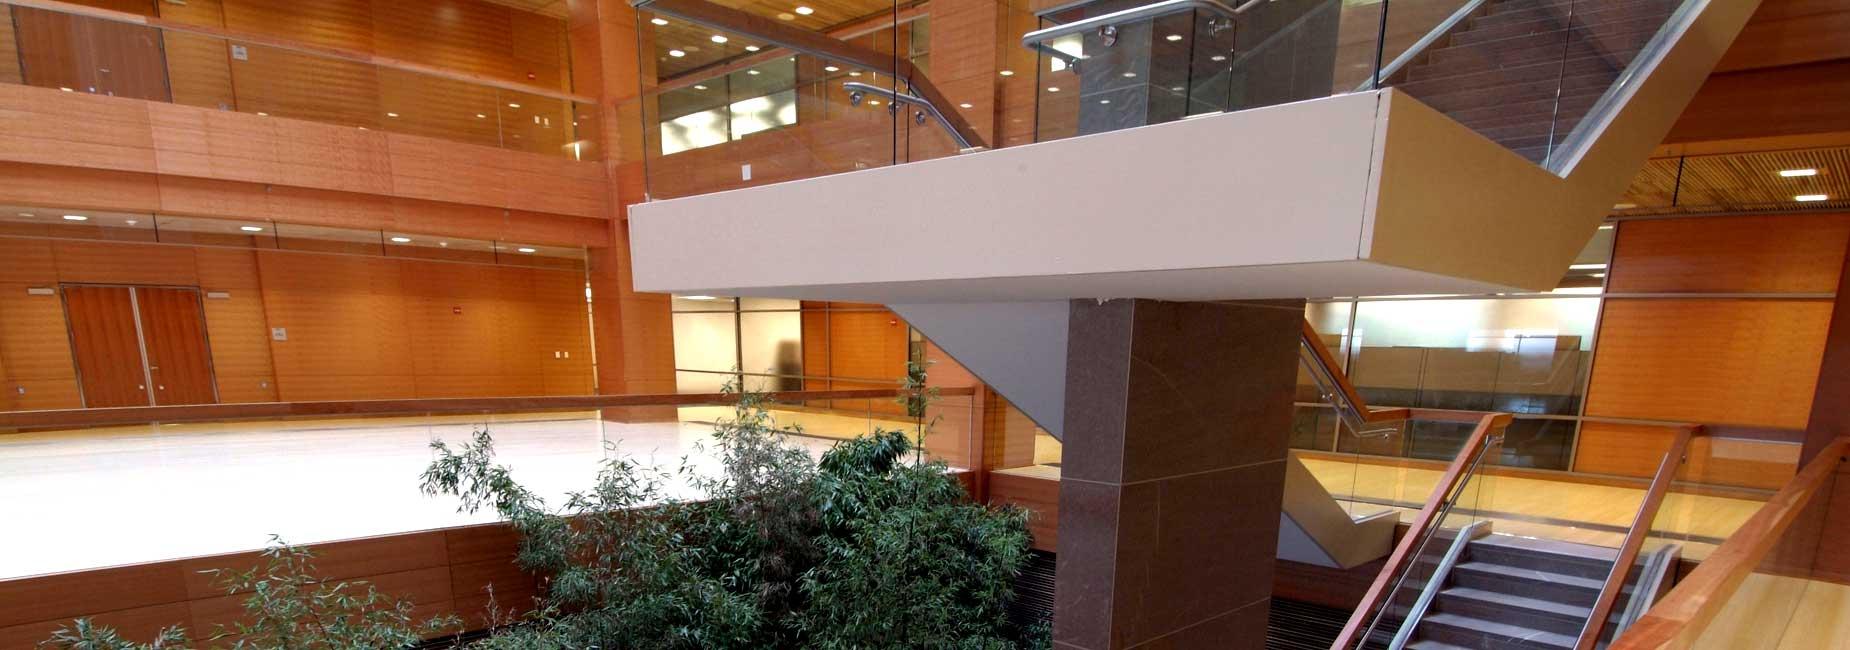 Custom Architectural Millwork